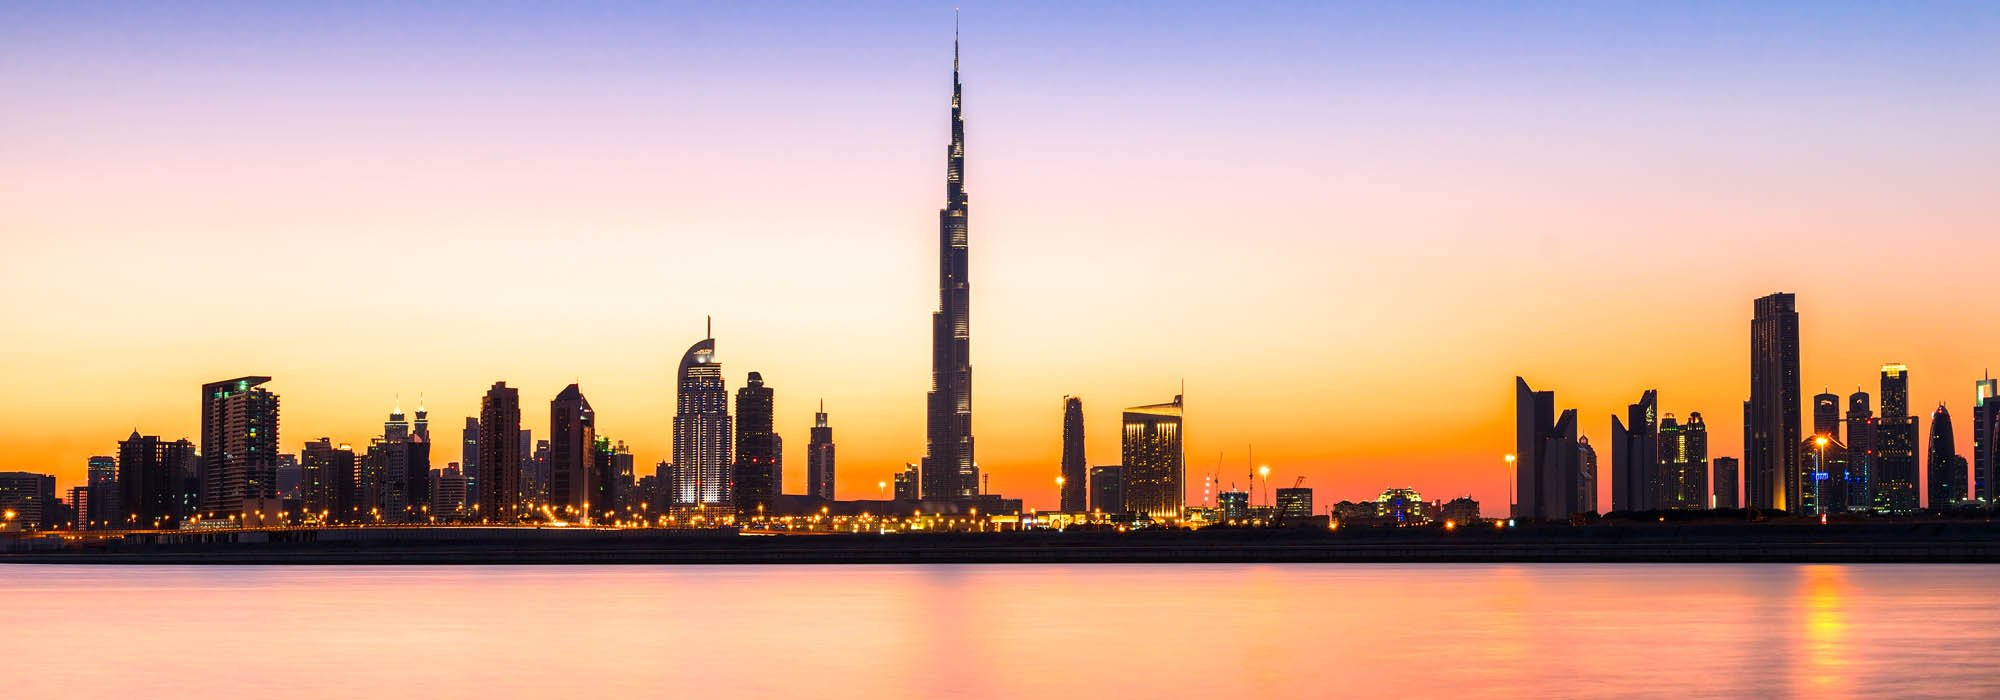 Dubai Skyline Impact Image Goway